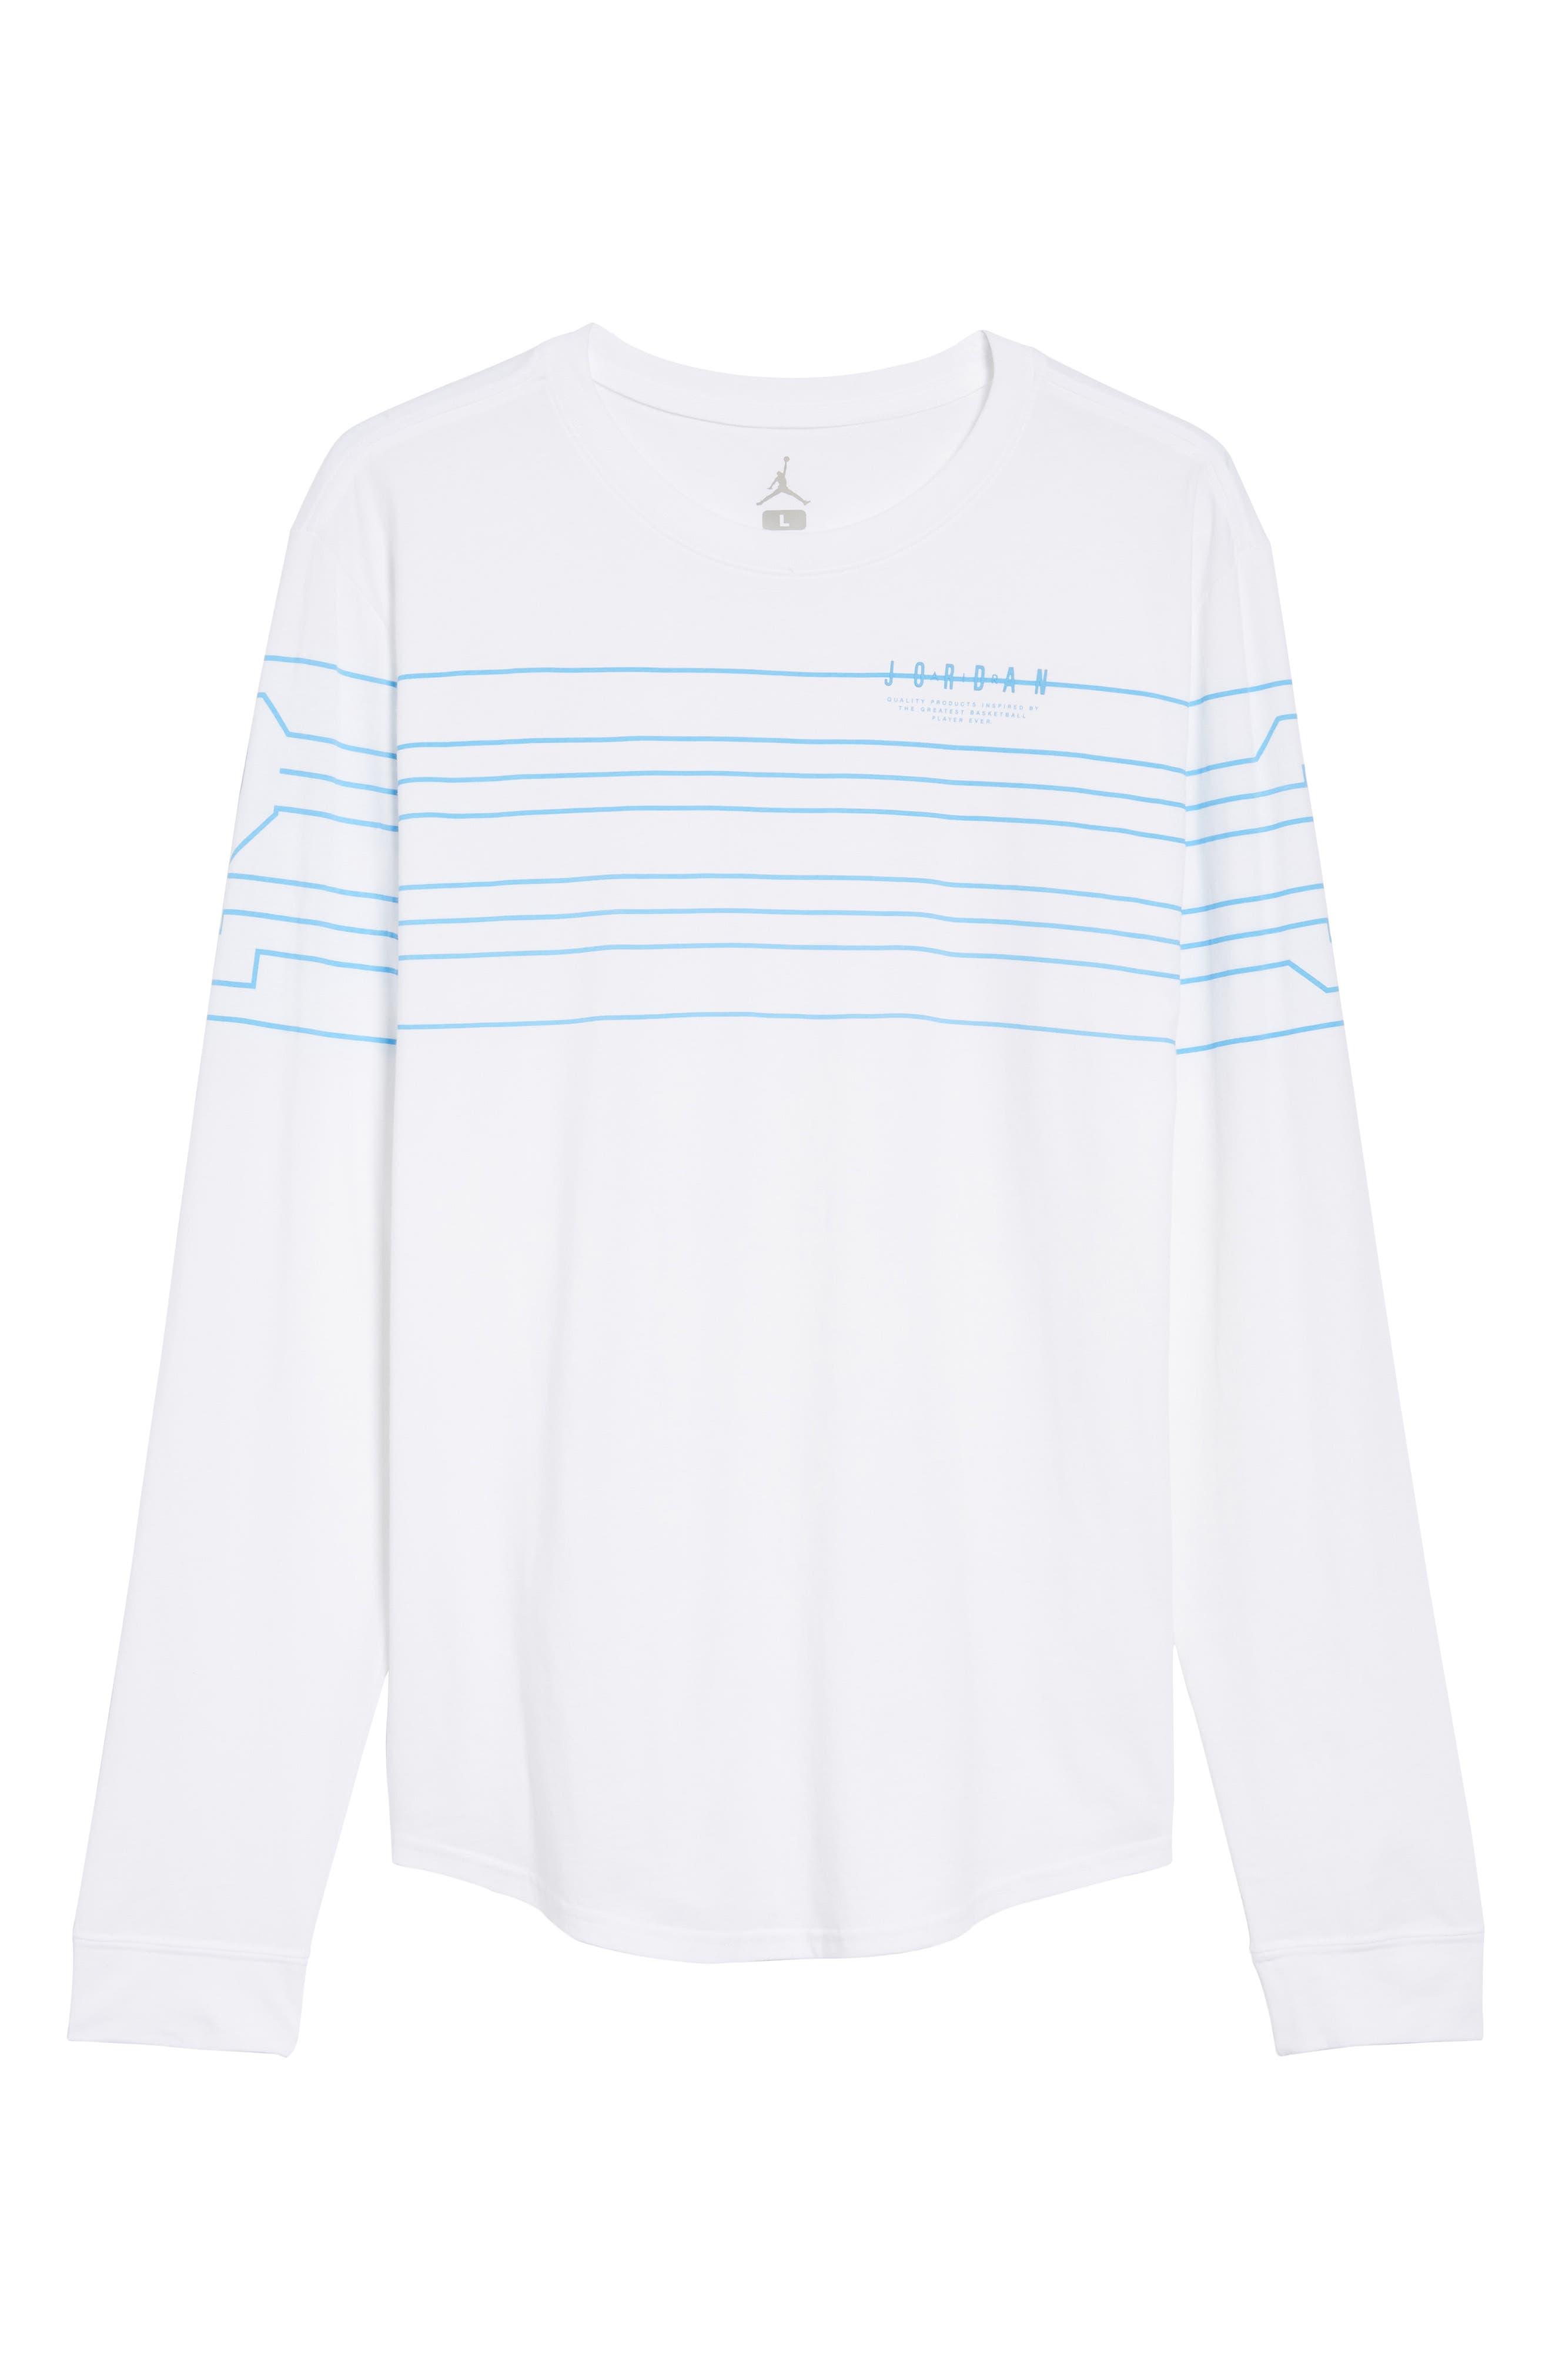 Sportswear 23 T-Shirt,                             Alternate thumbnail 12, color,